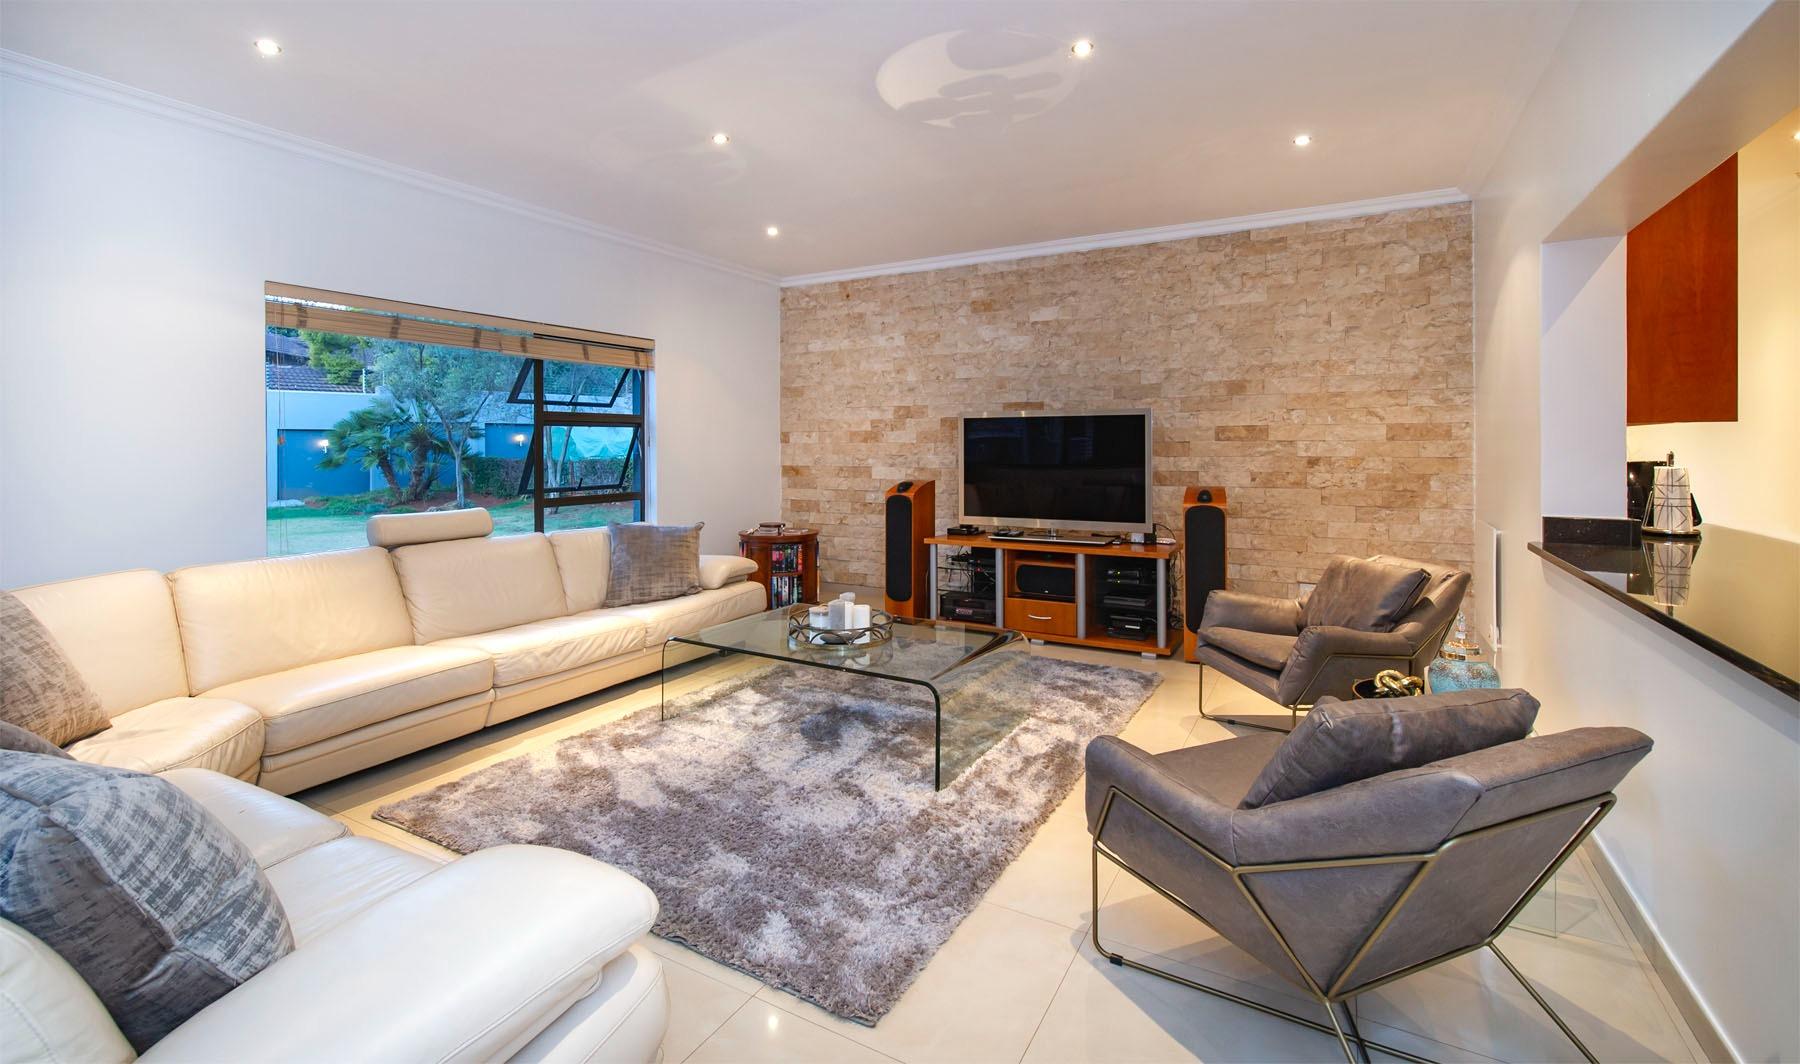 4 Bedroom House For Sale in Bedfordview